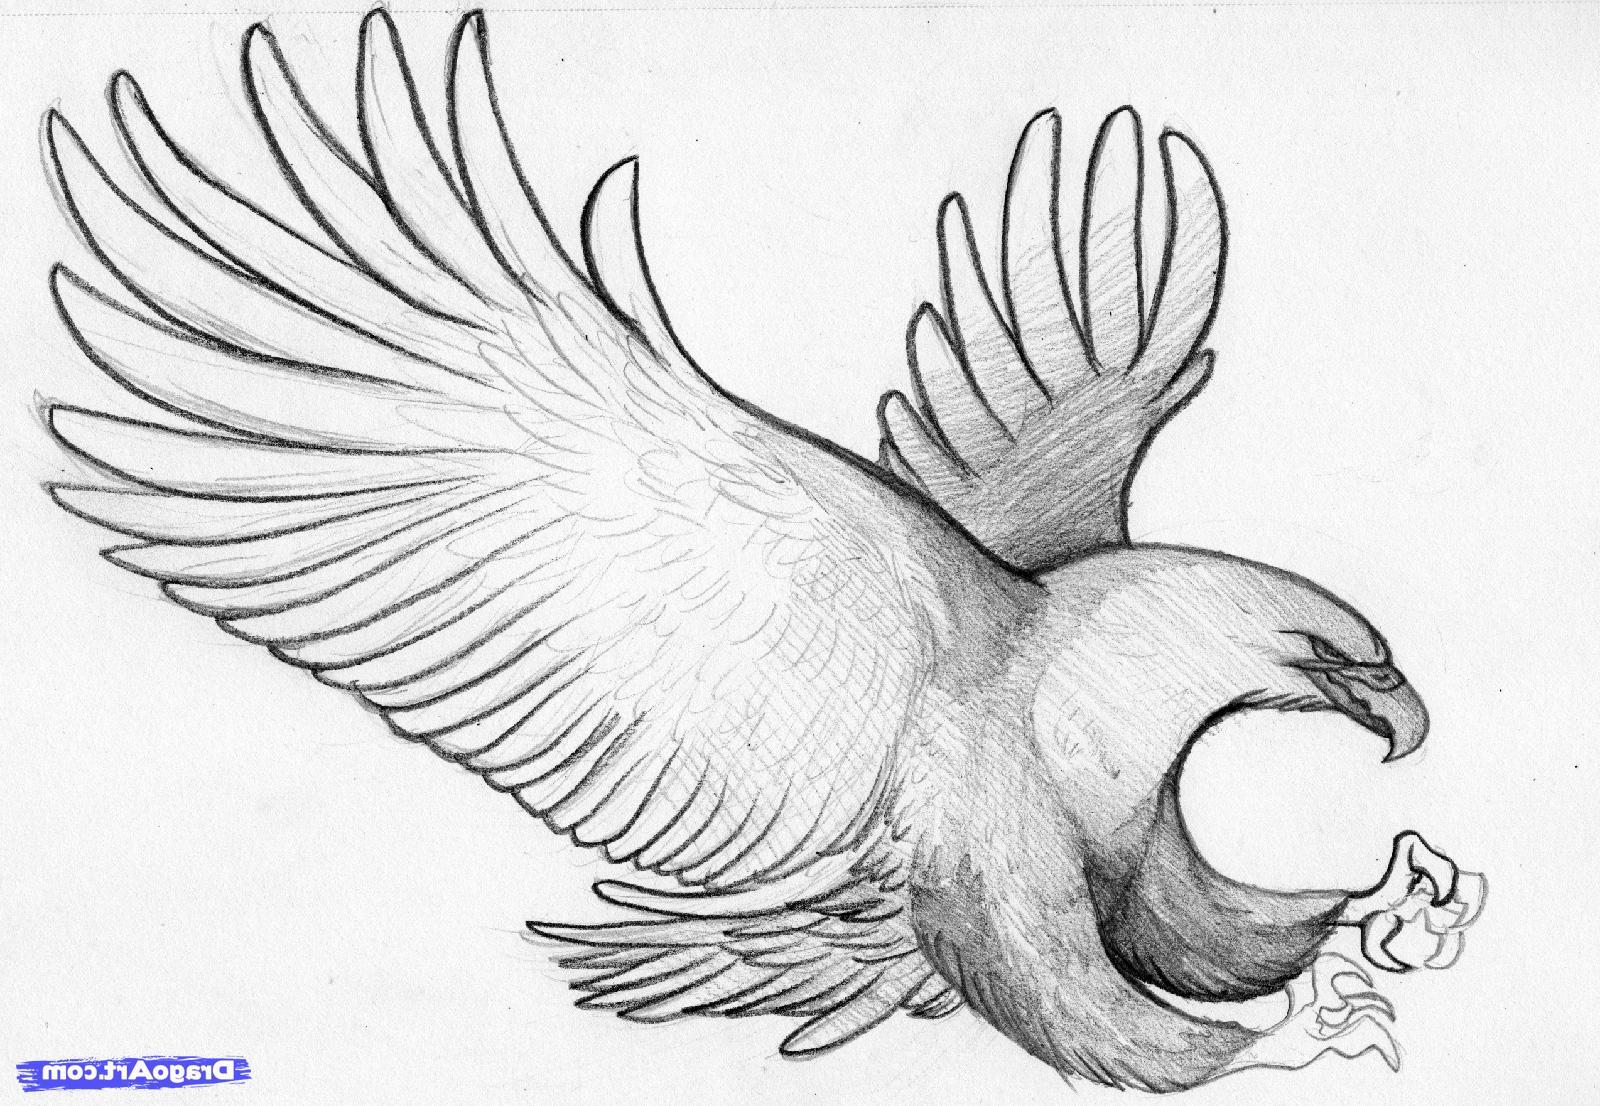 1600x1106 Birds Pencil Painting Images Pencil Drawings Pencil Drawings